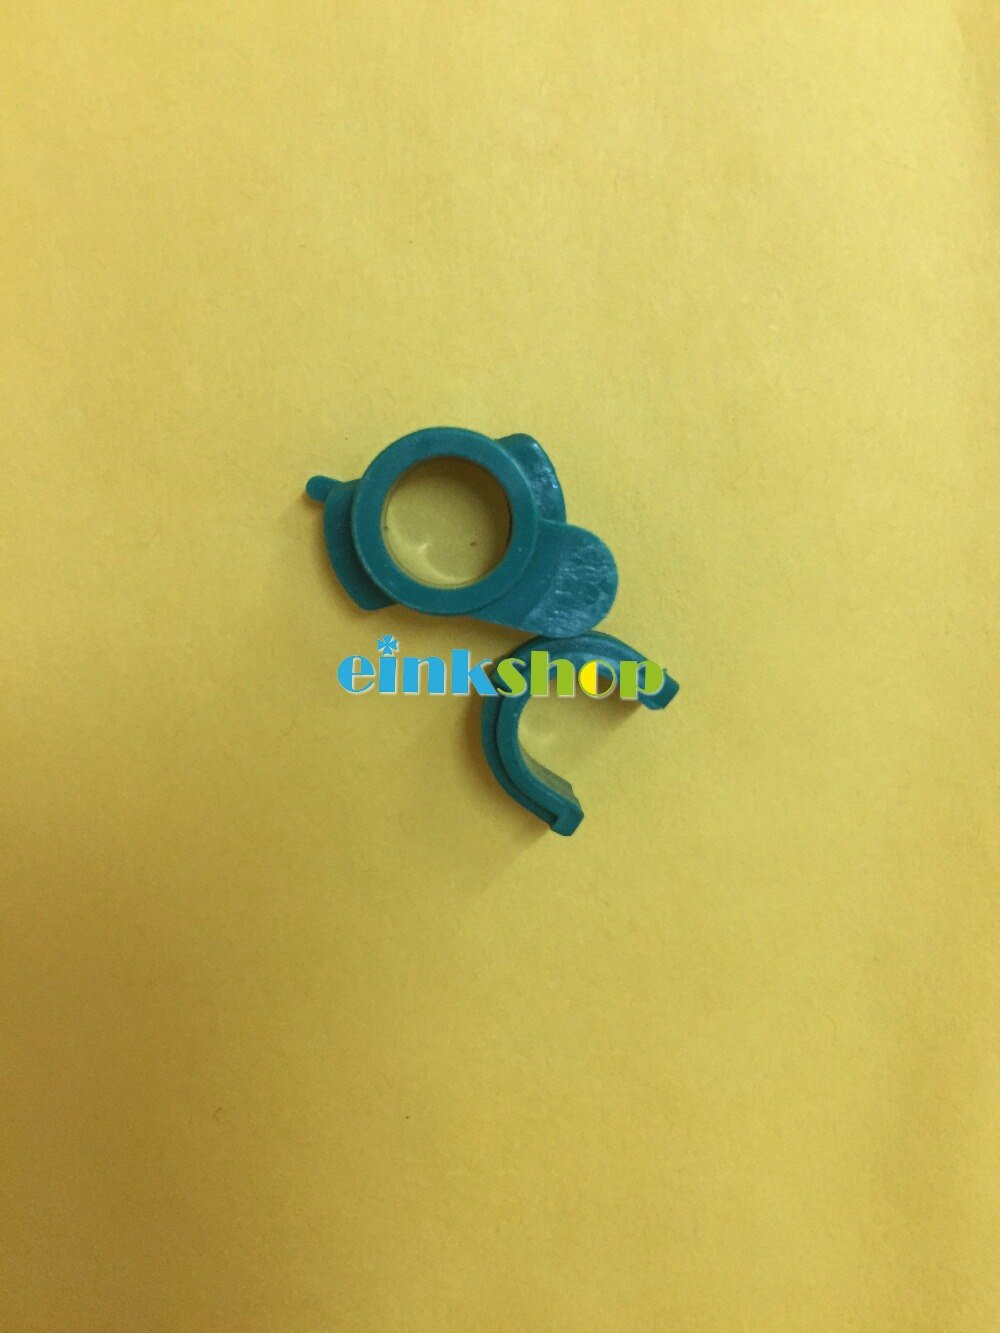 Einkshop rodillo presión buje casquillo buje del rodillo inferior para HP 4200, 4250, 4300, 4350, 4345 RC1-3361-000 RC1-3362-000